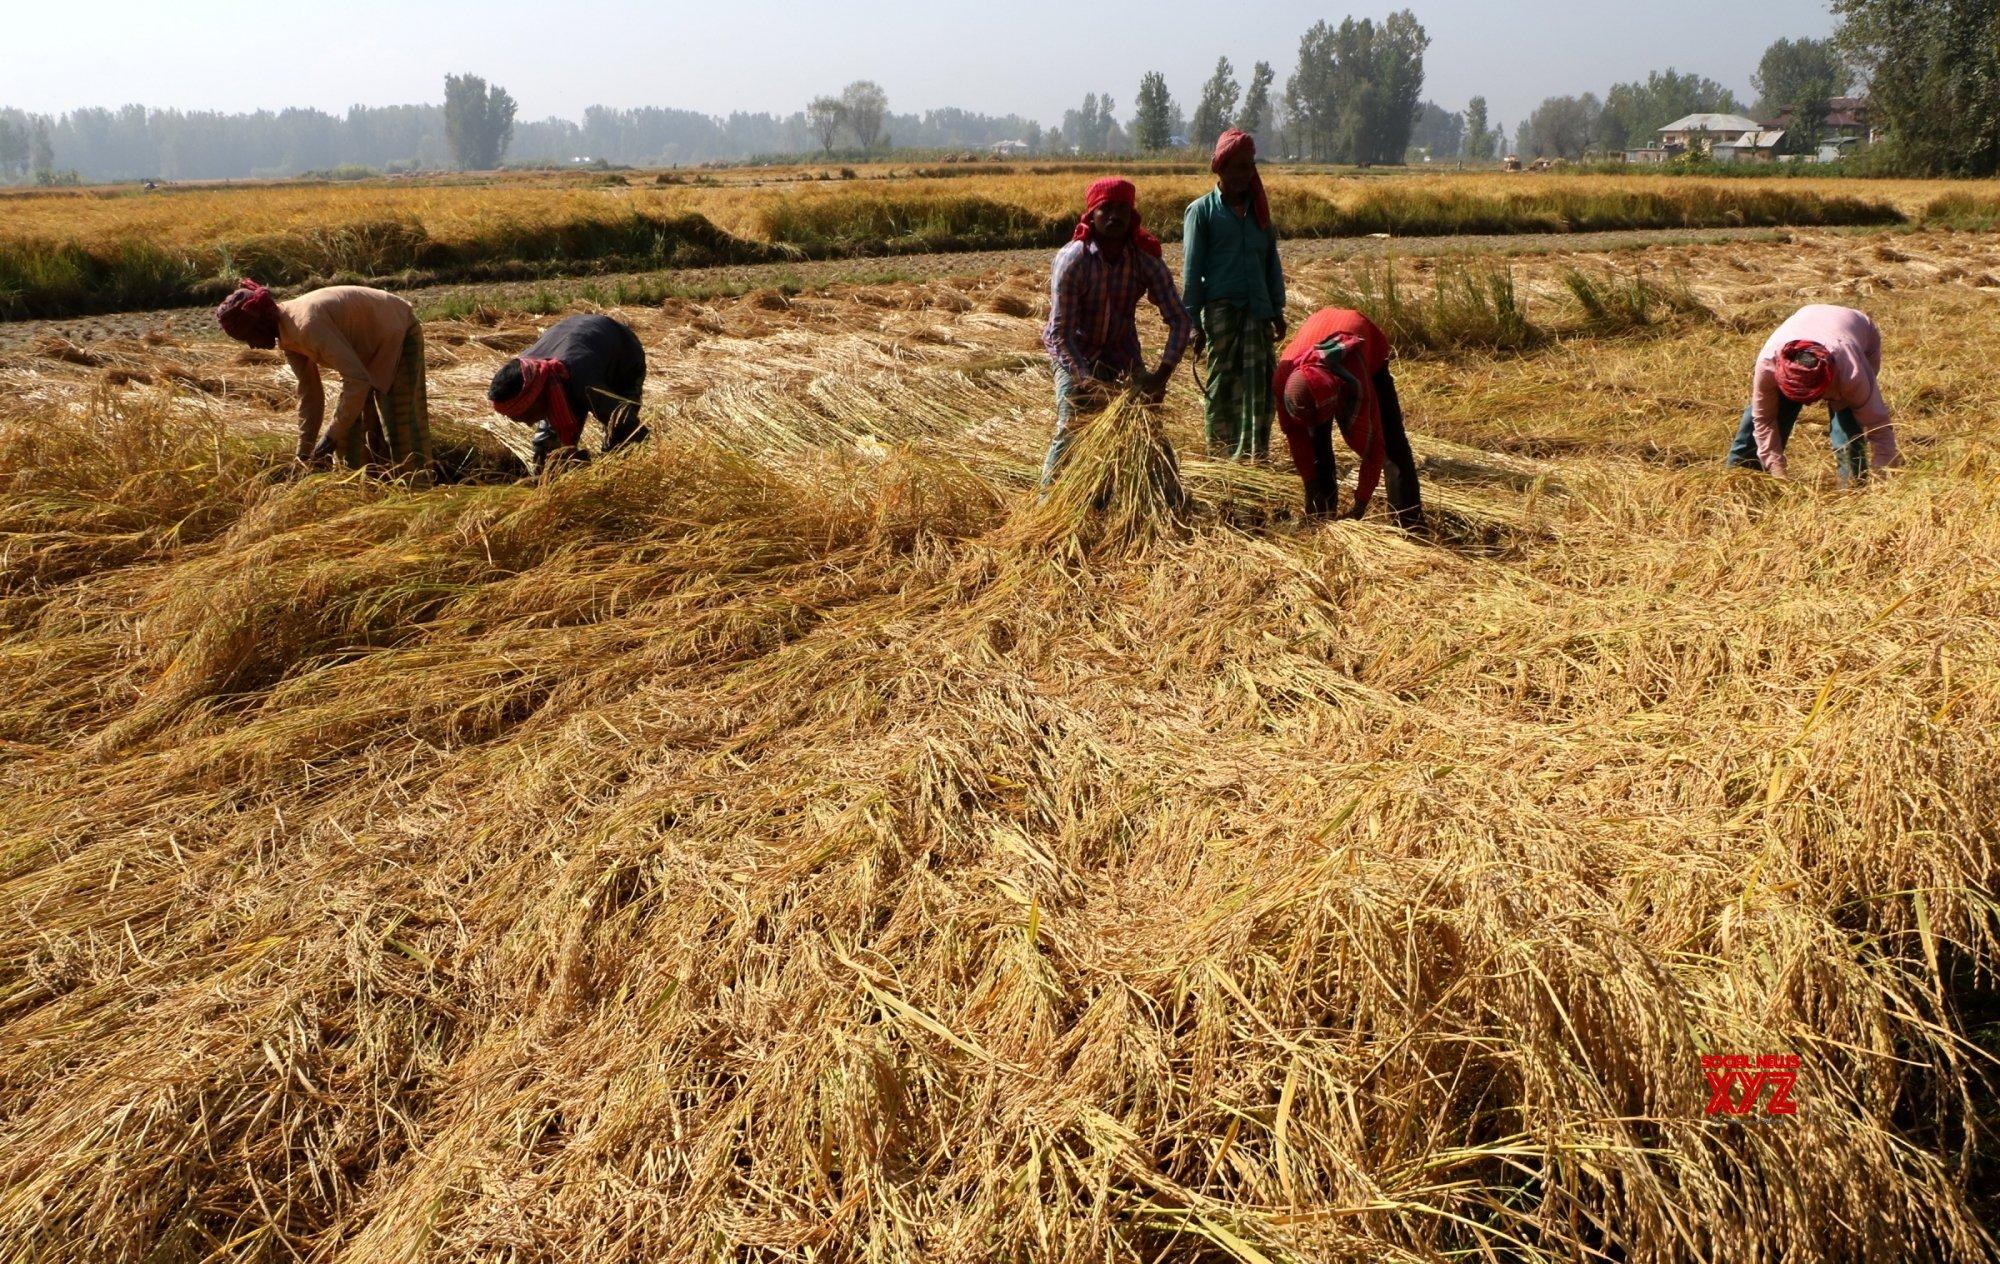 Punjab, Haryana farmers fear lockdown may hit harvesting, procurement